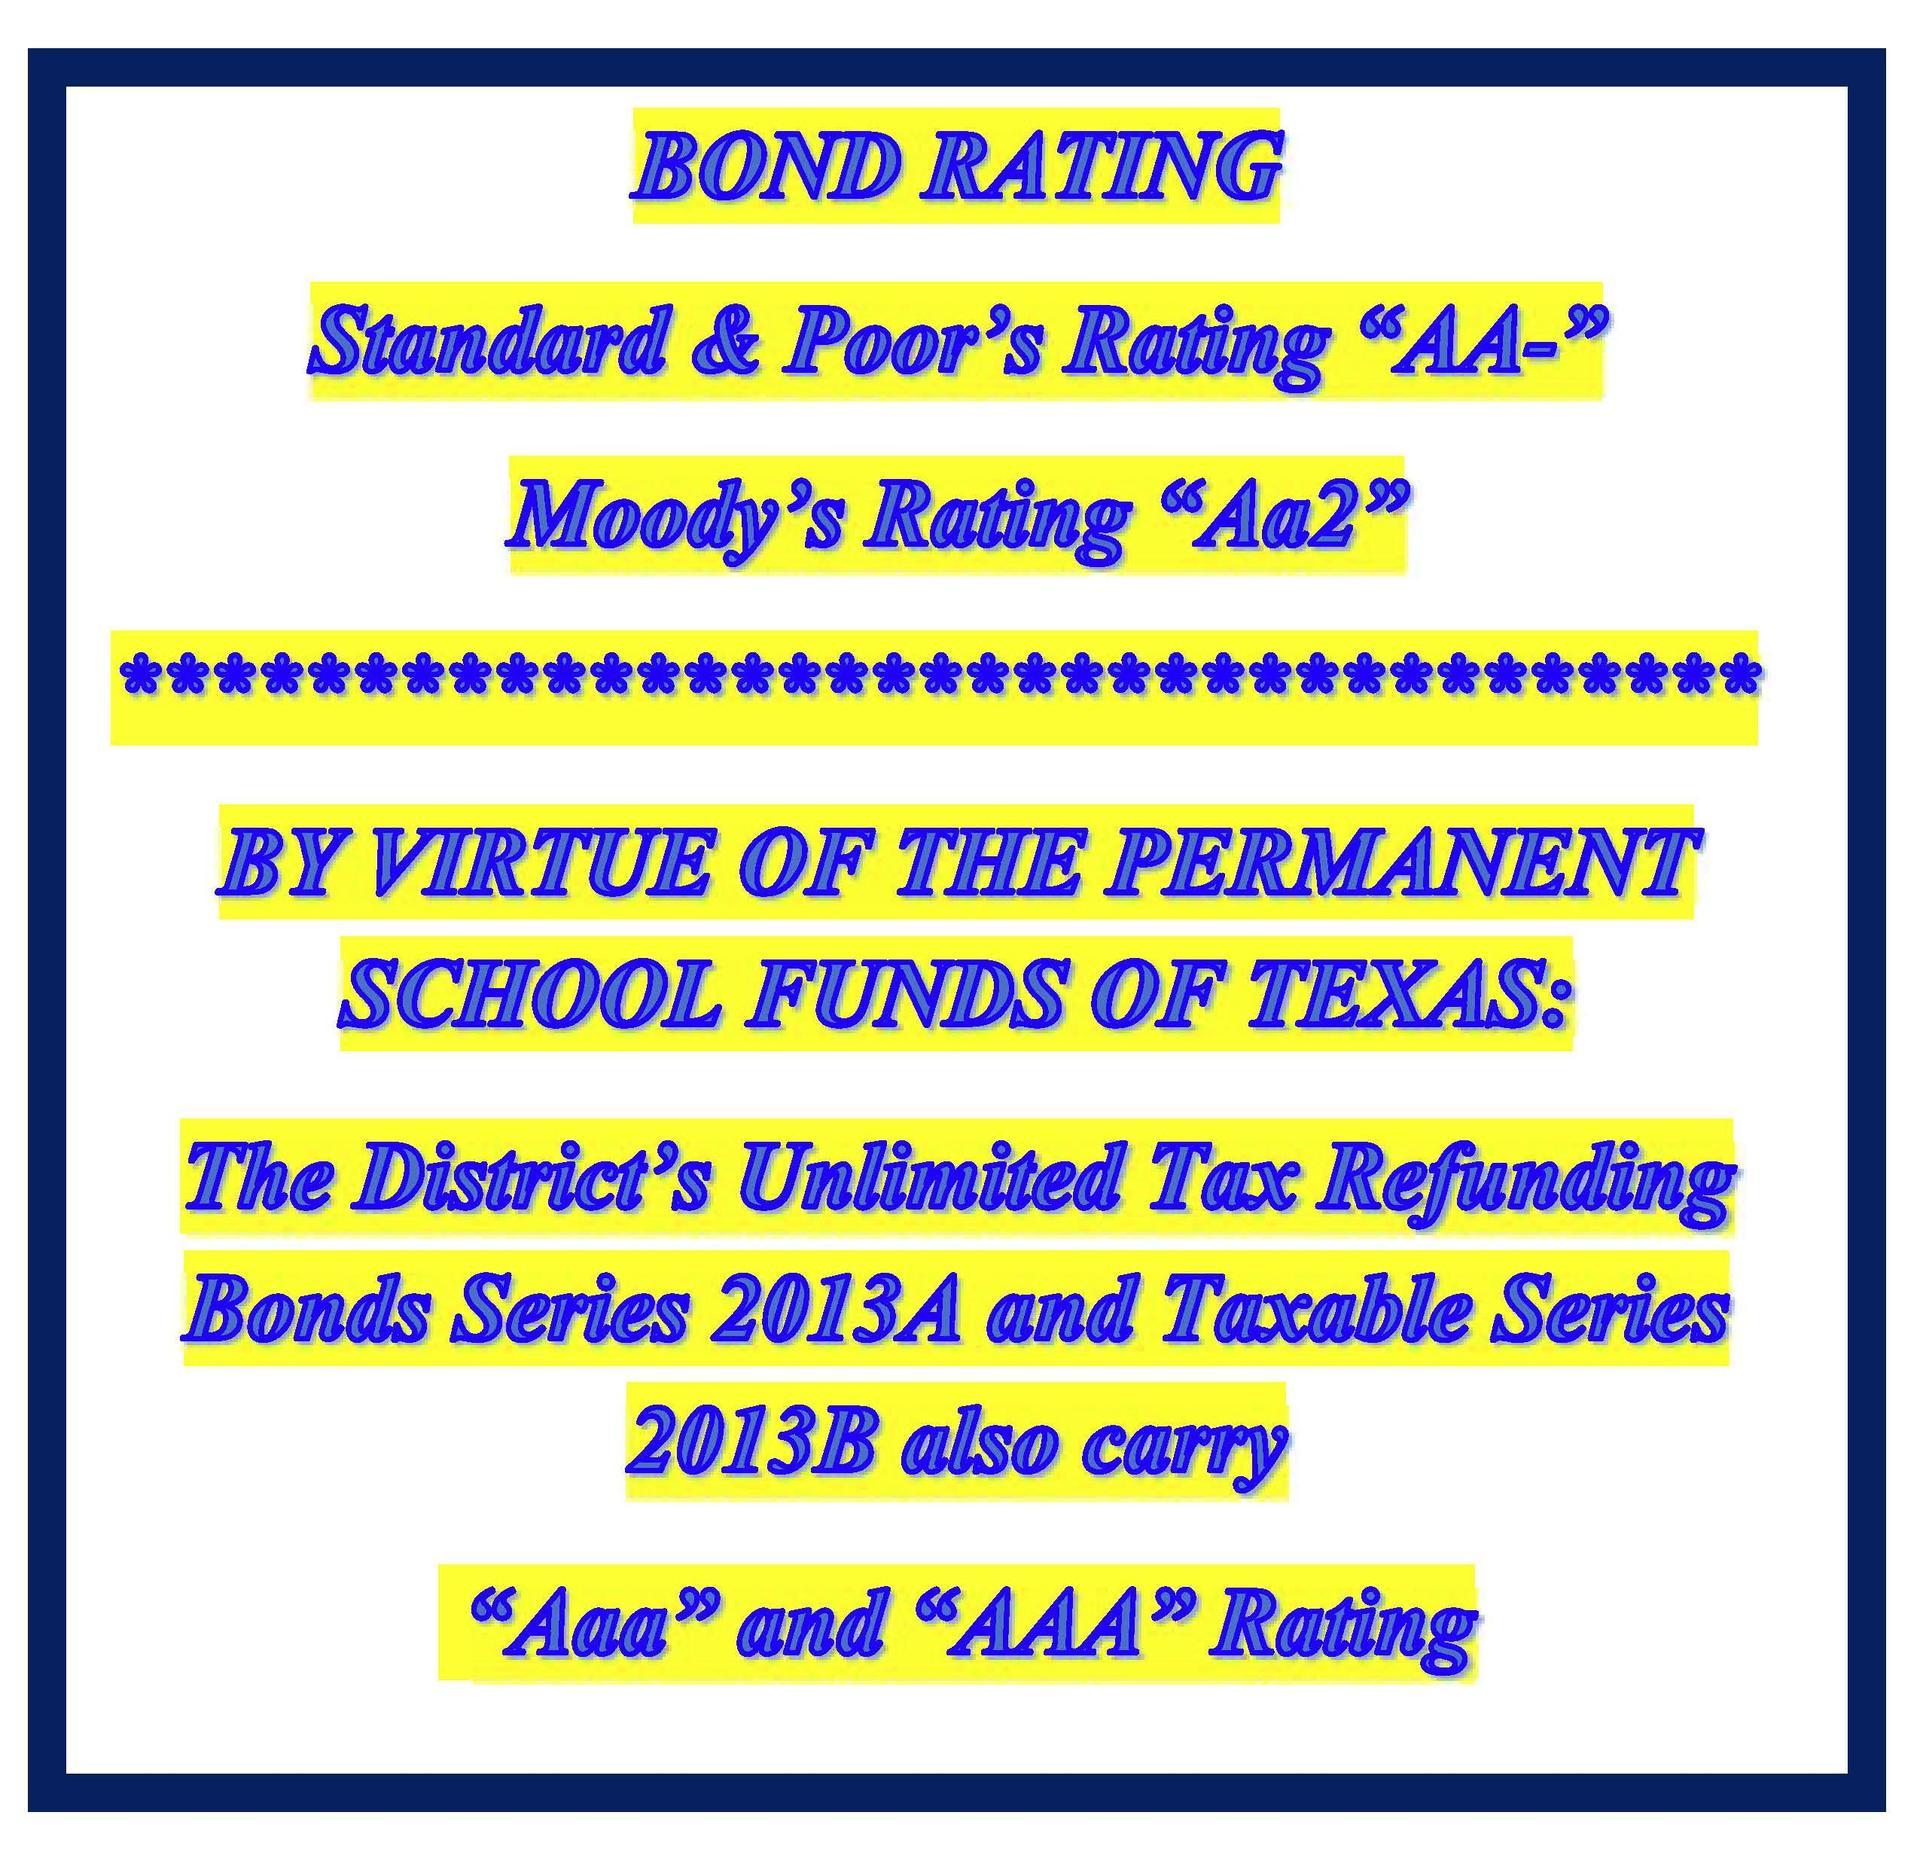 Bond Rating 5-14-19